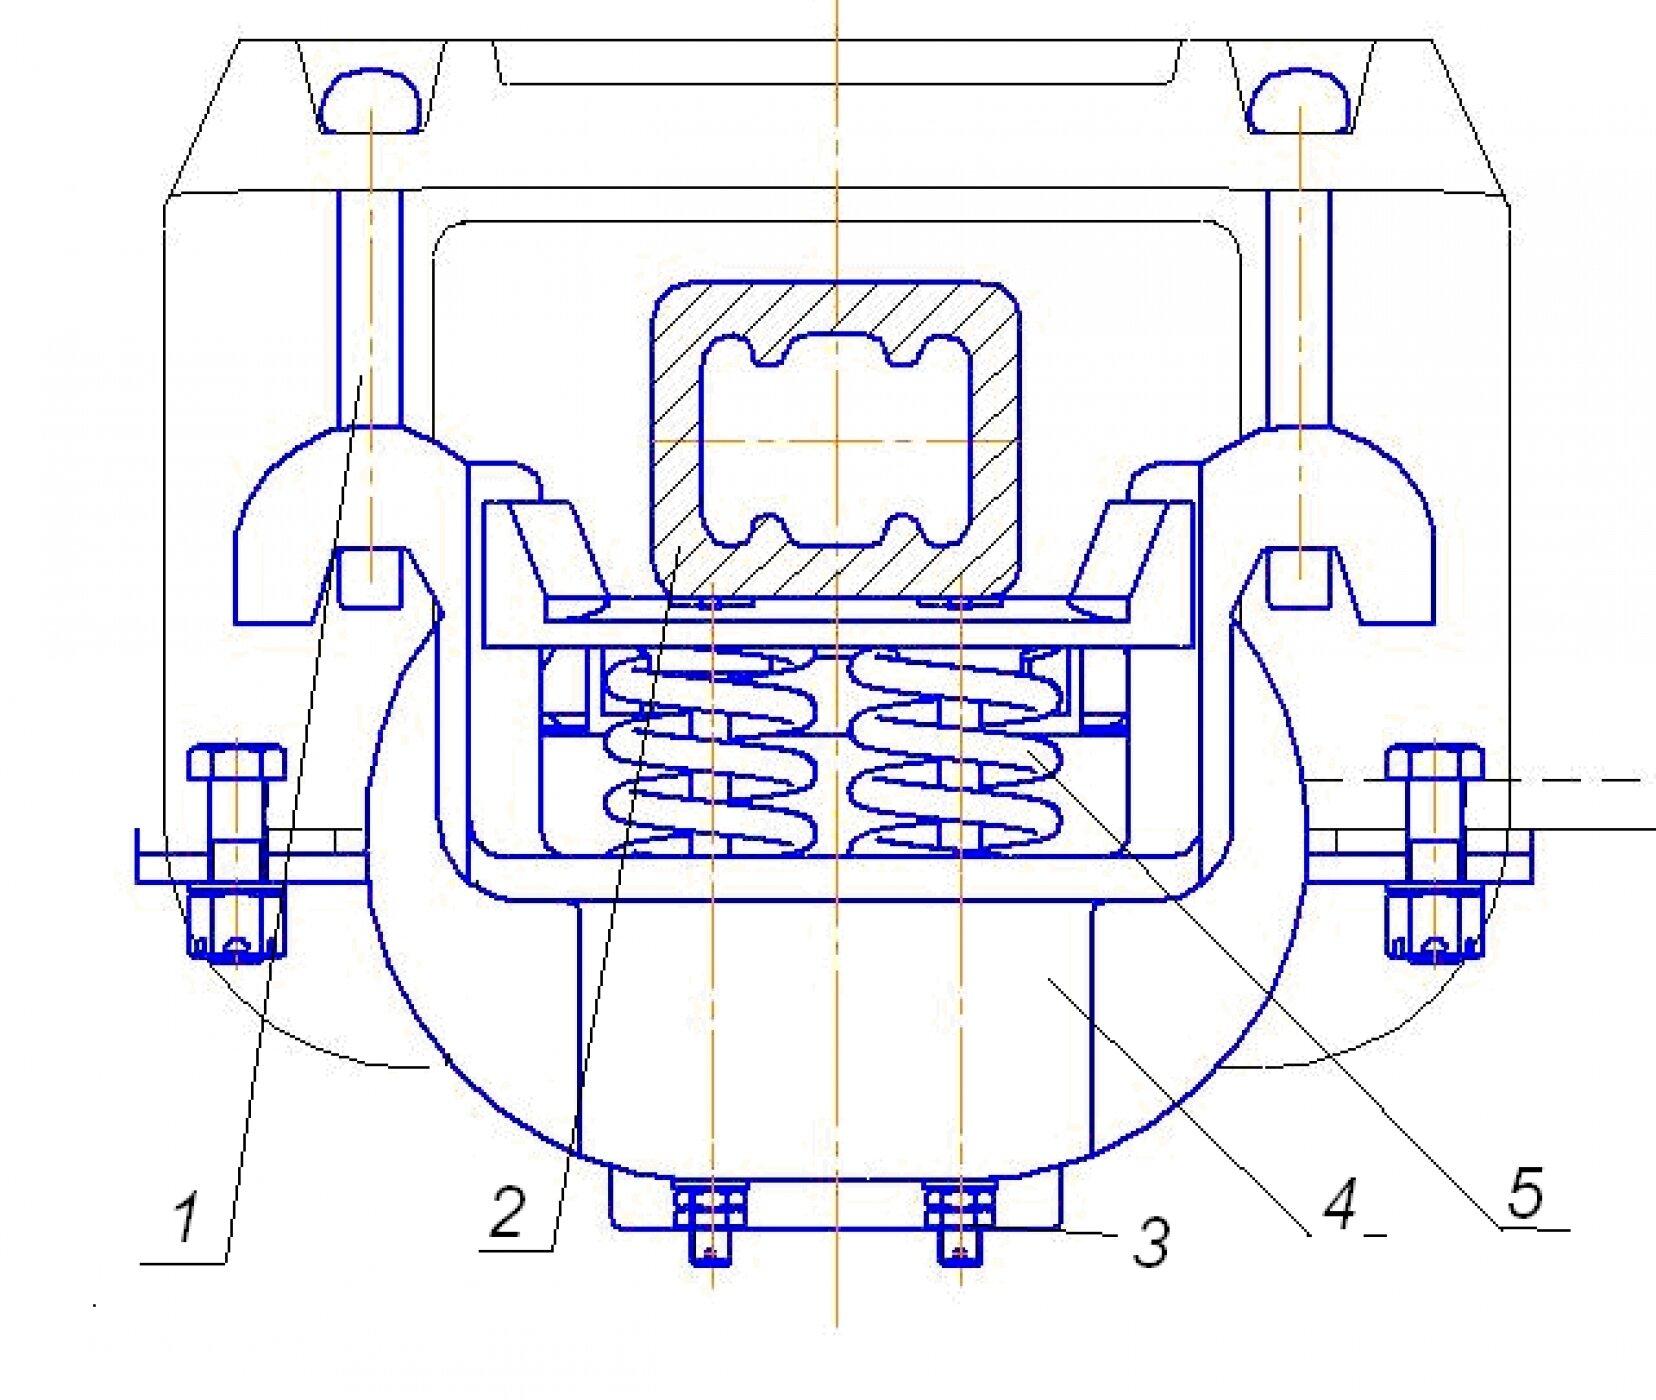 Балочка центрирующая 1835.00.110 СБ - фото pic_b02c1f21f72e7bcdbf127b4973afd652_1920x9000_1.jpg